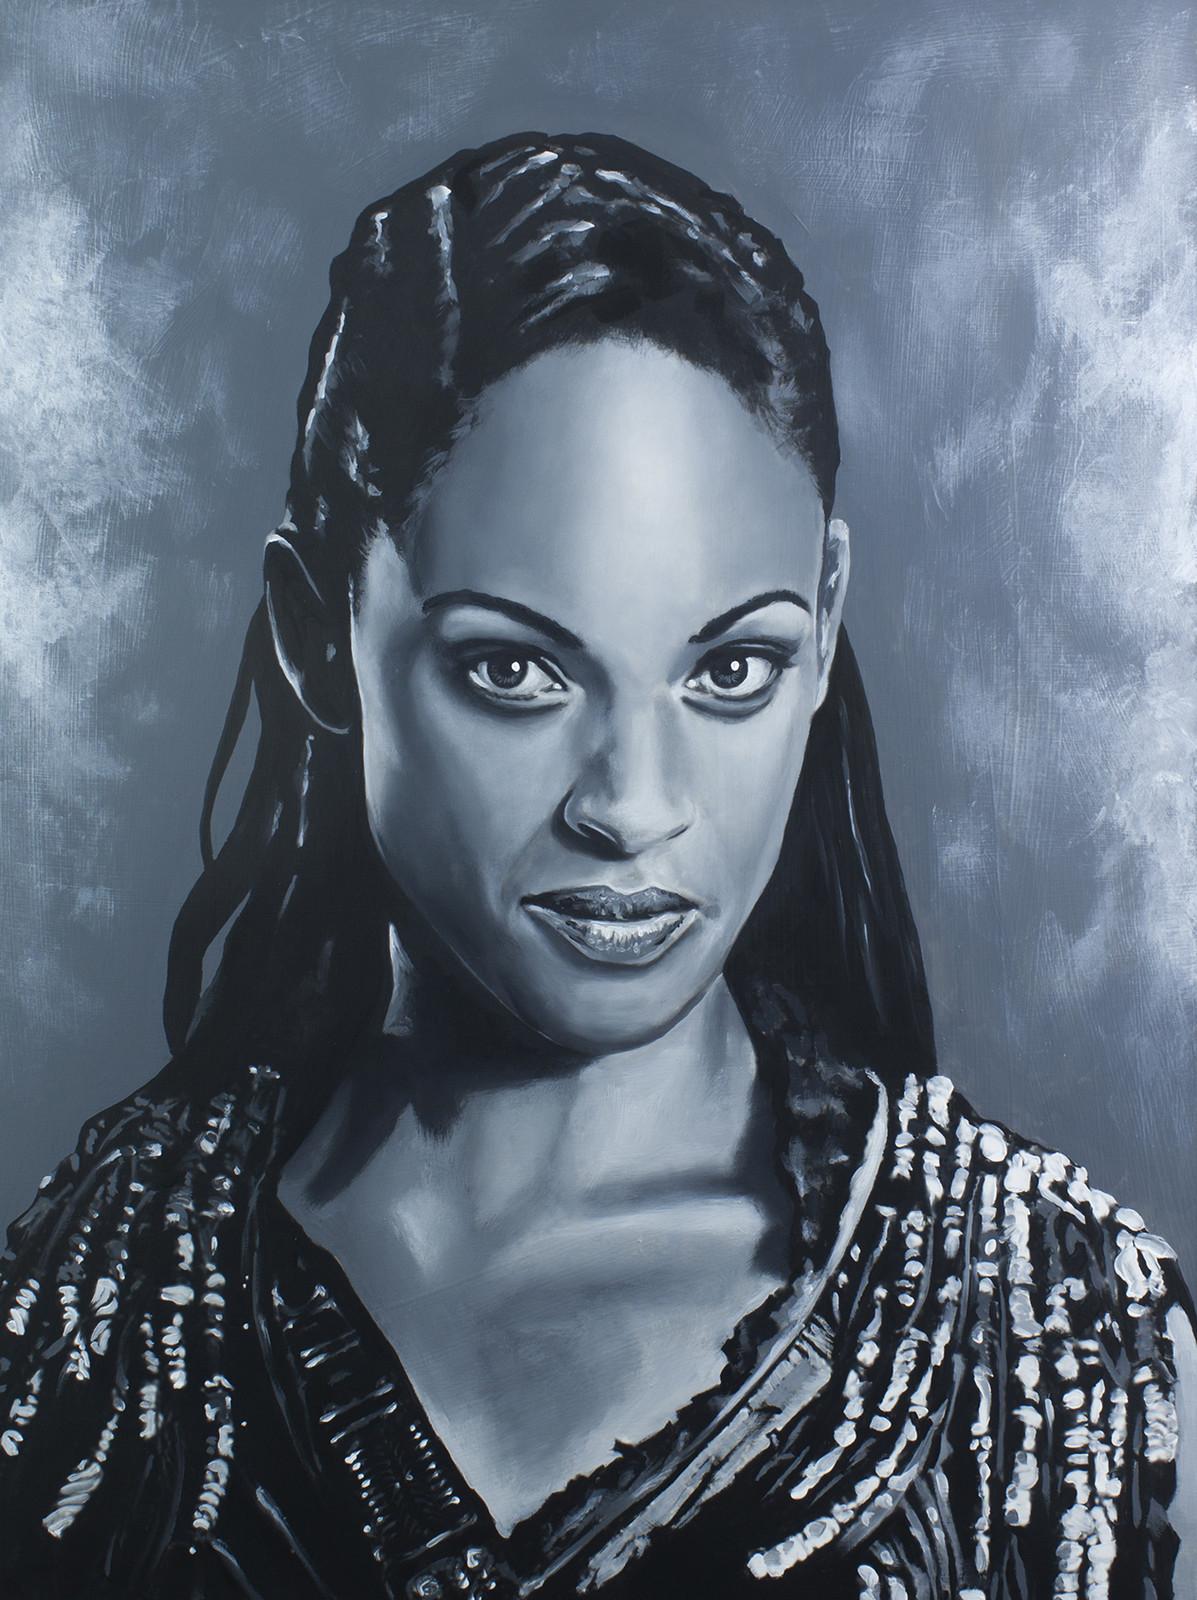 Naevia - Cynthia Addai-Robinson Spartacus Series - Acrylic on board. 16x20